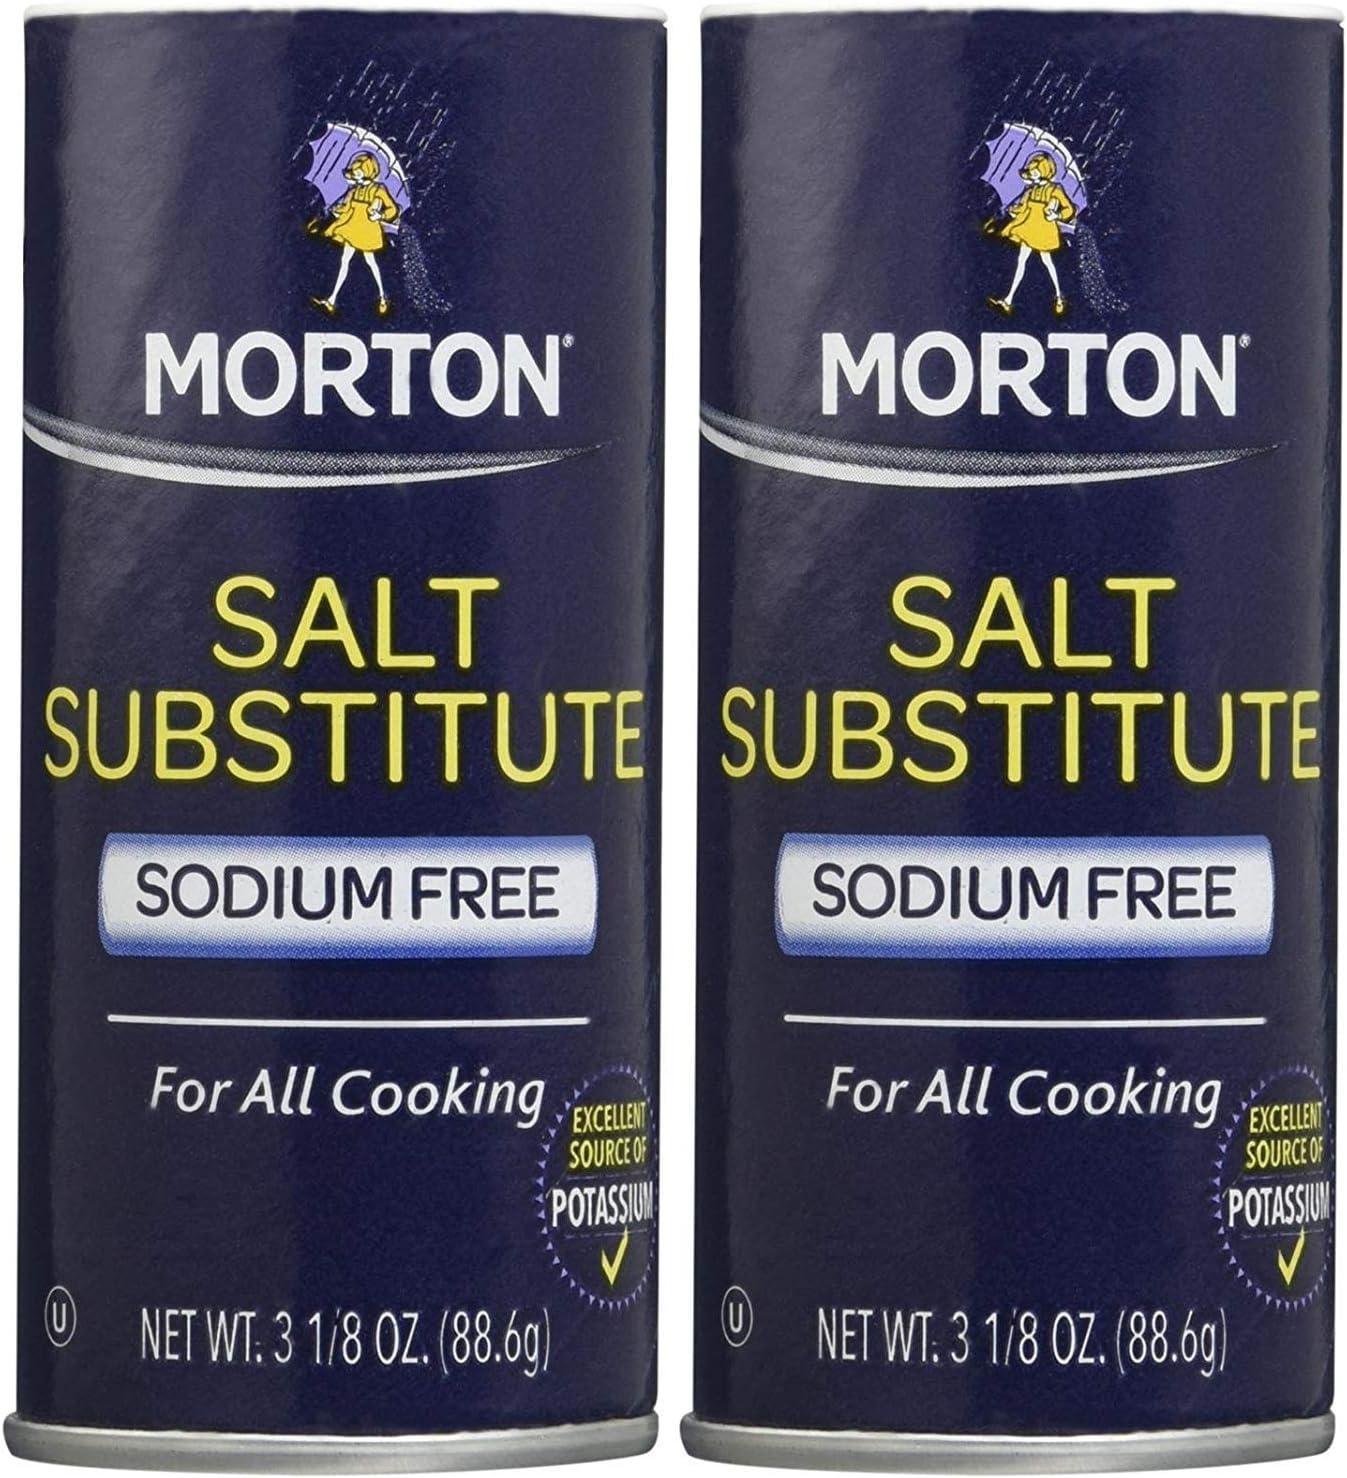 Morton Some reservation Salt Substitute 3.12 2 Direct store pk oz